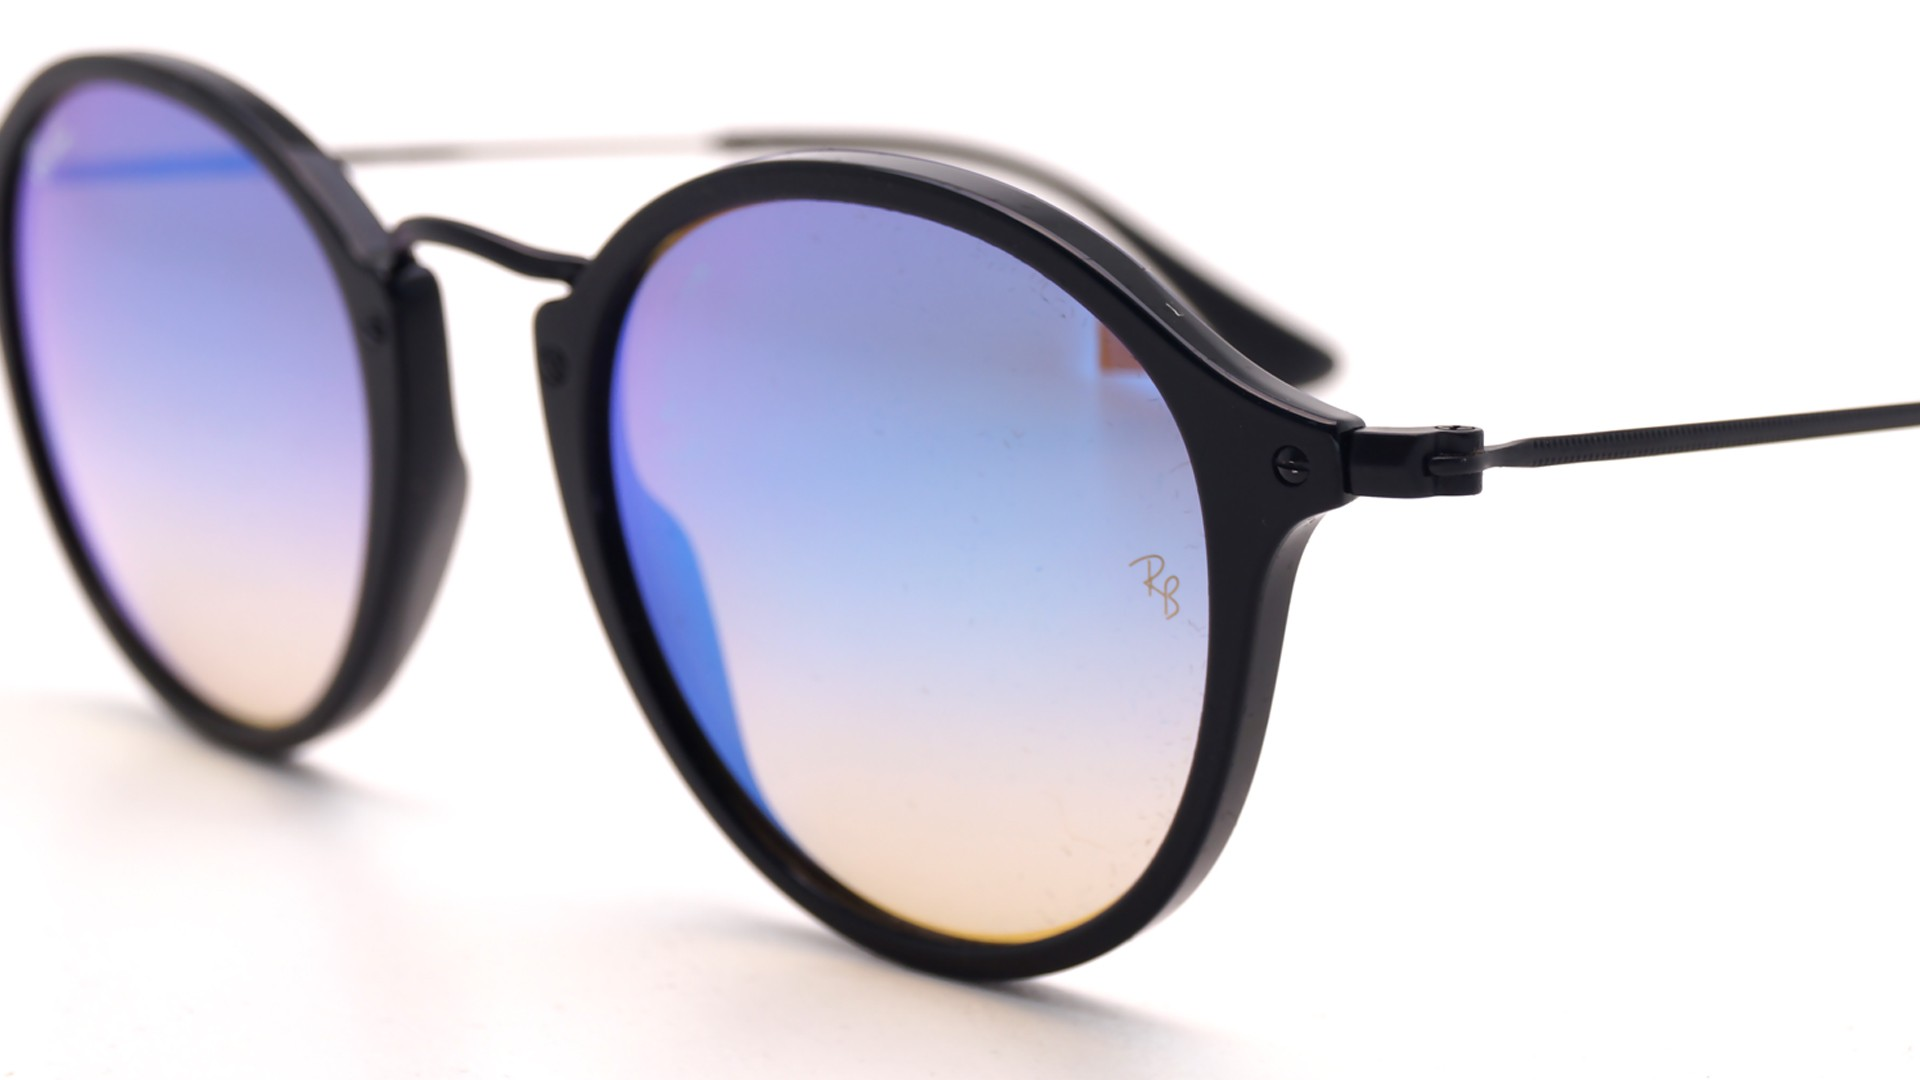 e043983b75 Sunglasses Ray-Ban Round Fleck Black RB2447 901 4O 49-21 Medium Gradient  Mirror